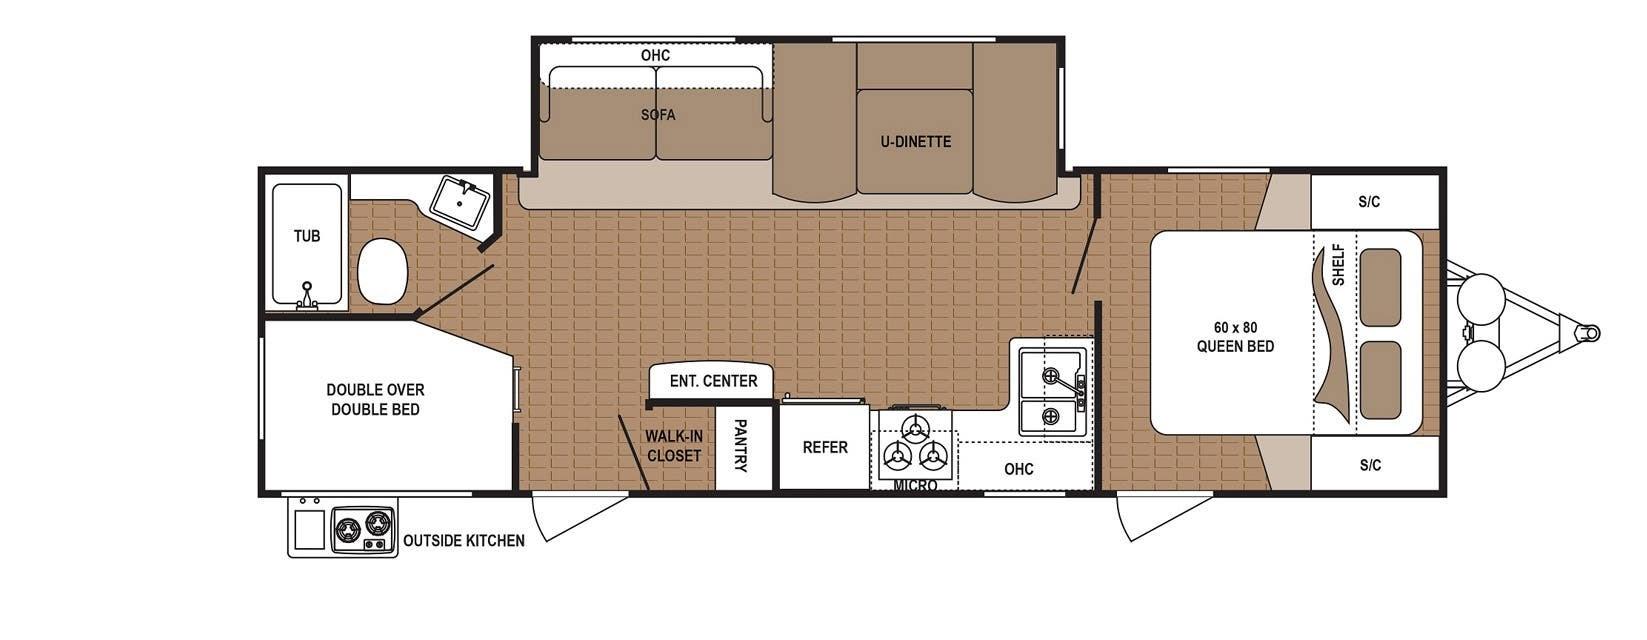 2019 Dutchmen Rv Aspen Trail 2790 Bhs For Sale In Apollo Pa 15613 Dutchman Pop Up Camper Wiring Diagram Previous